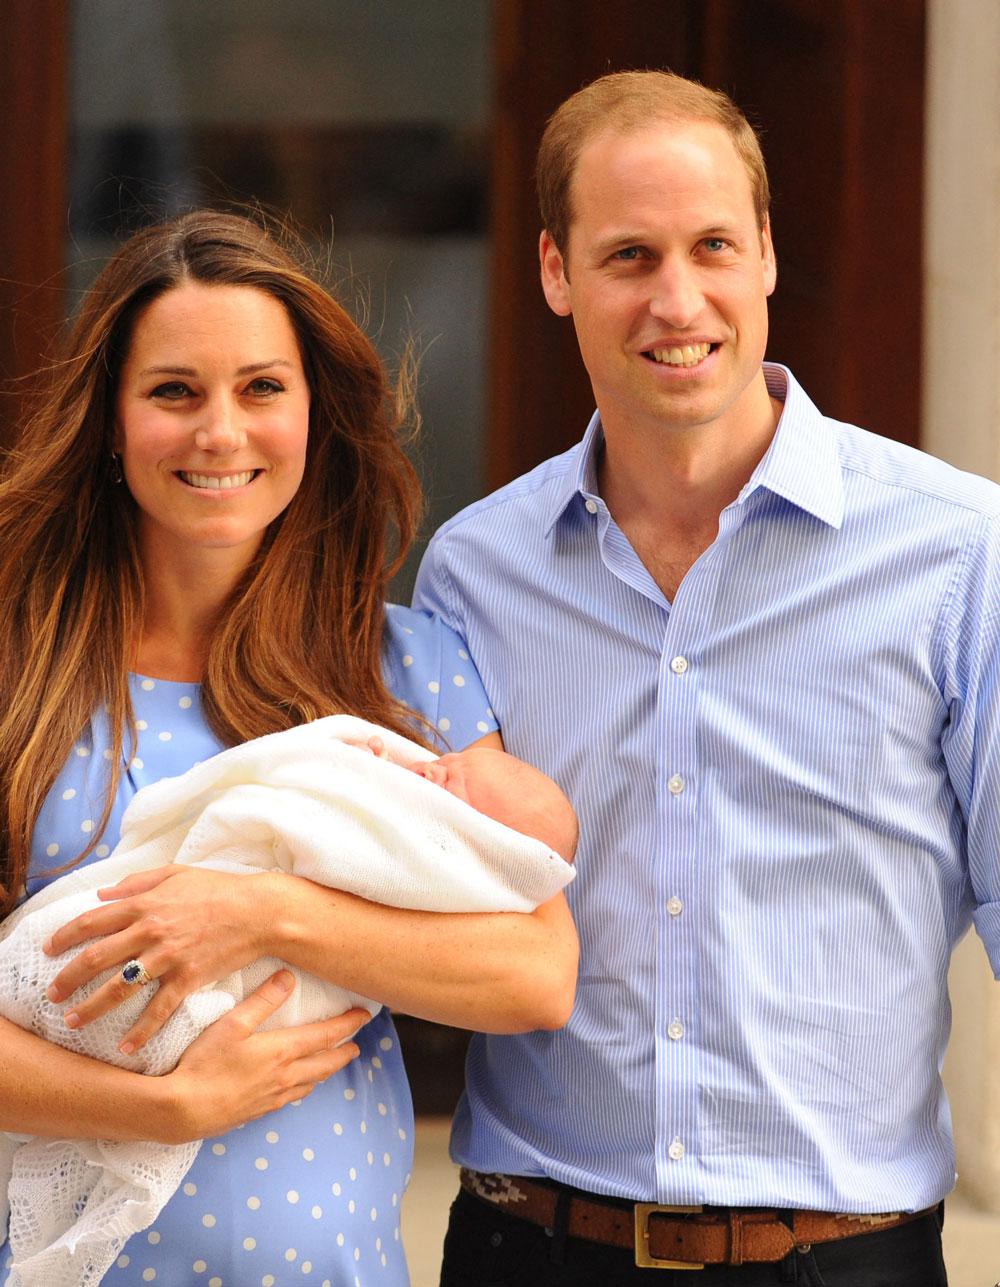 Kate Middleton : son traumatisme à la naissance du prince George - Elle